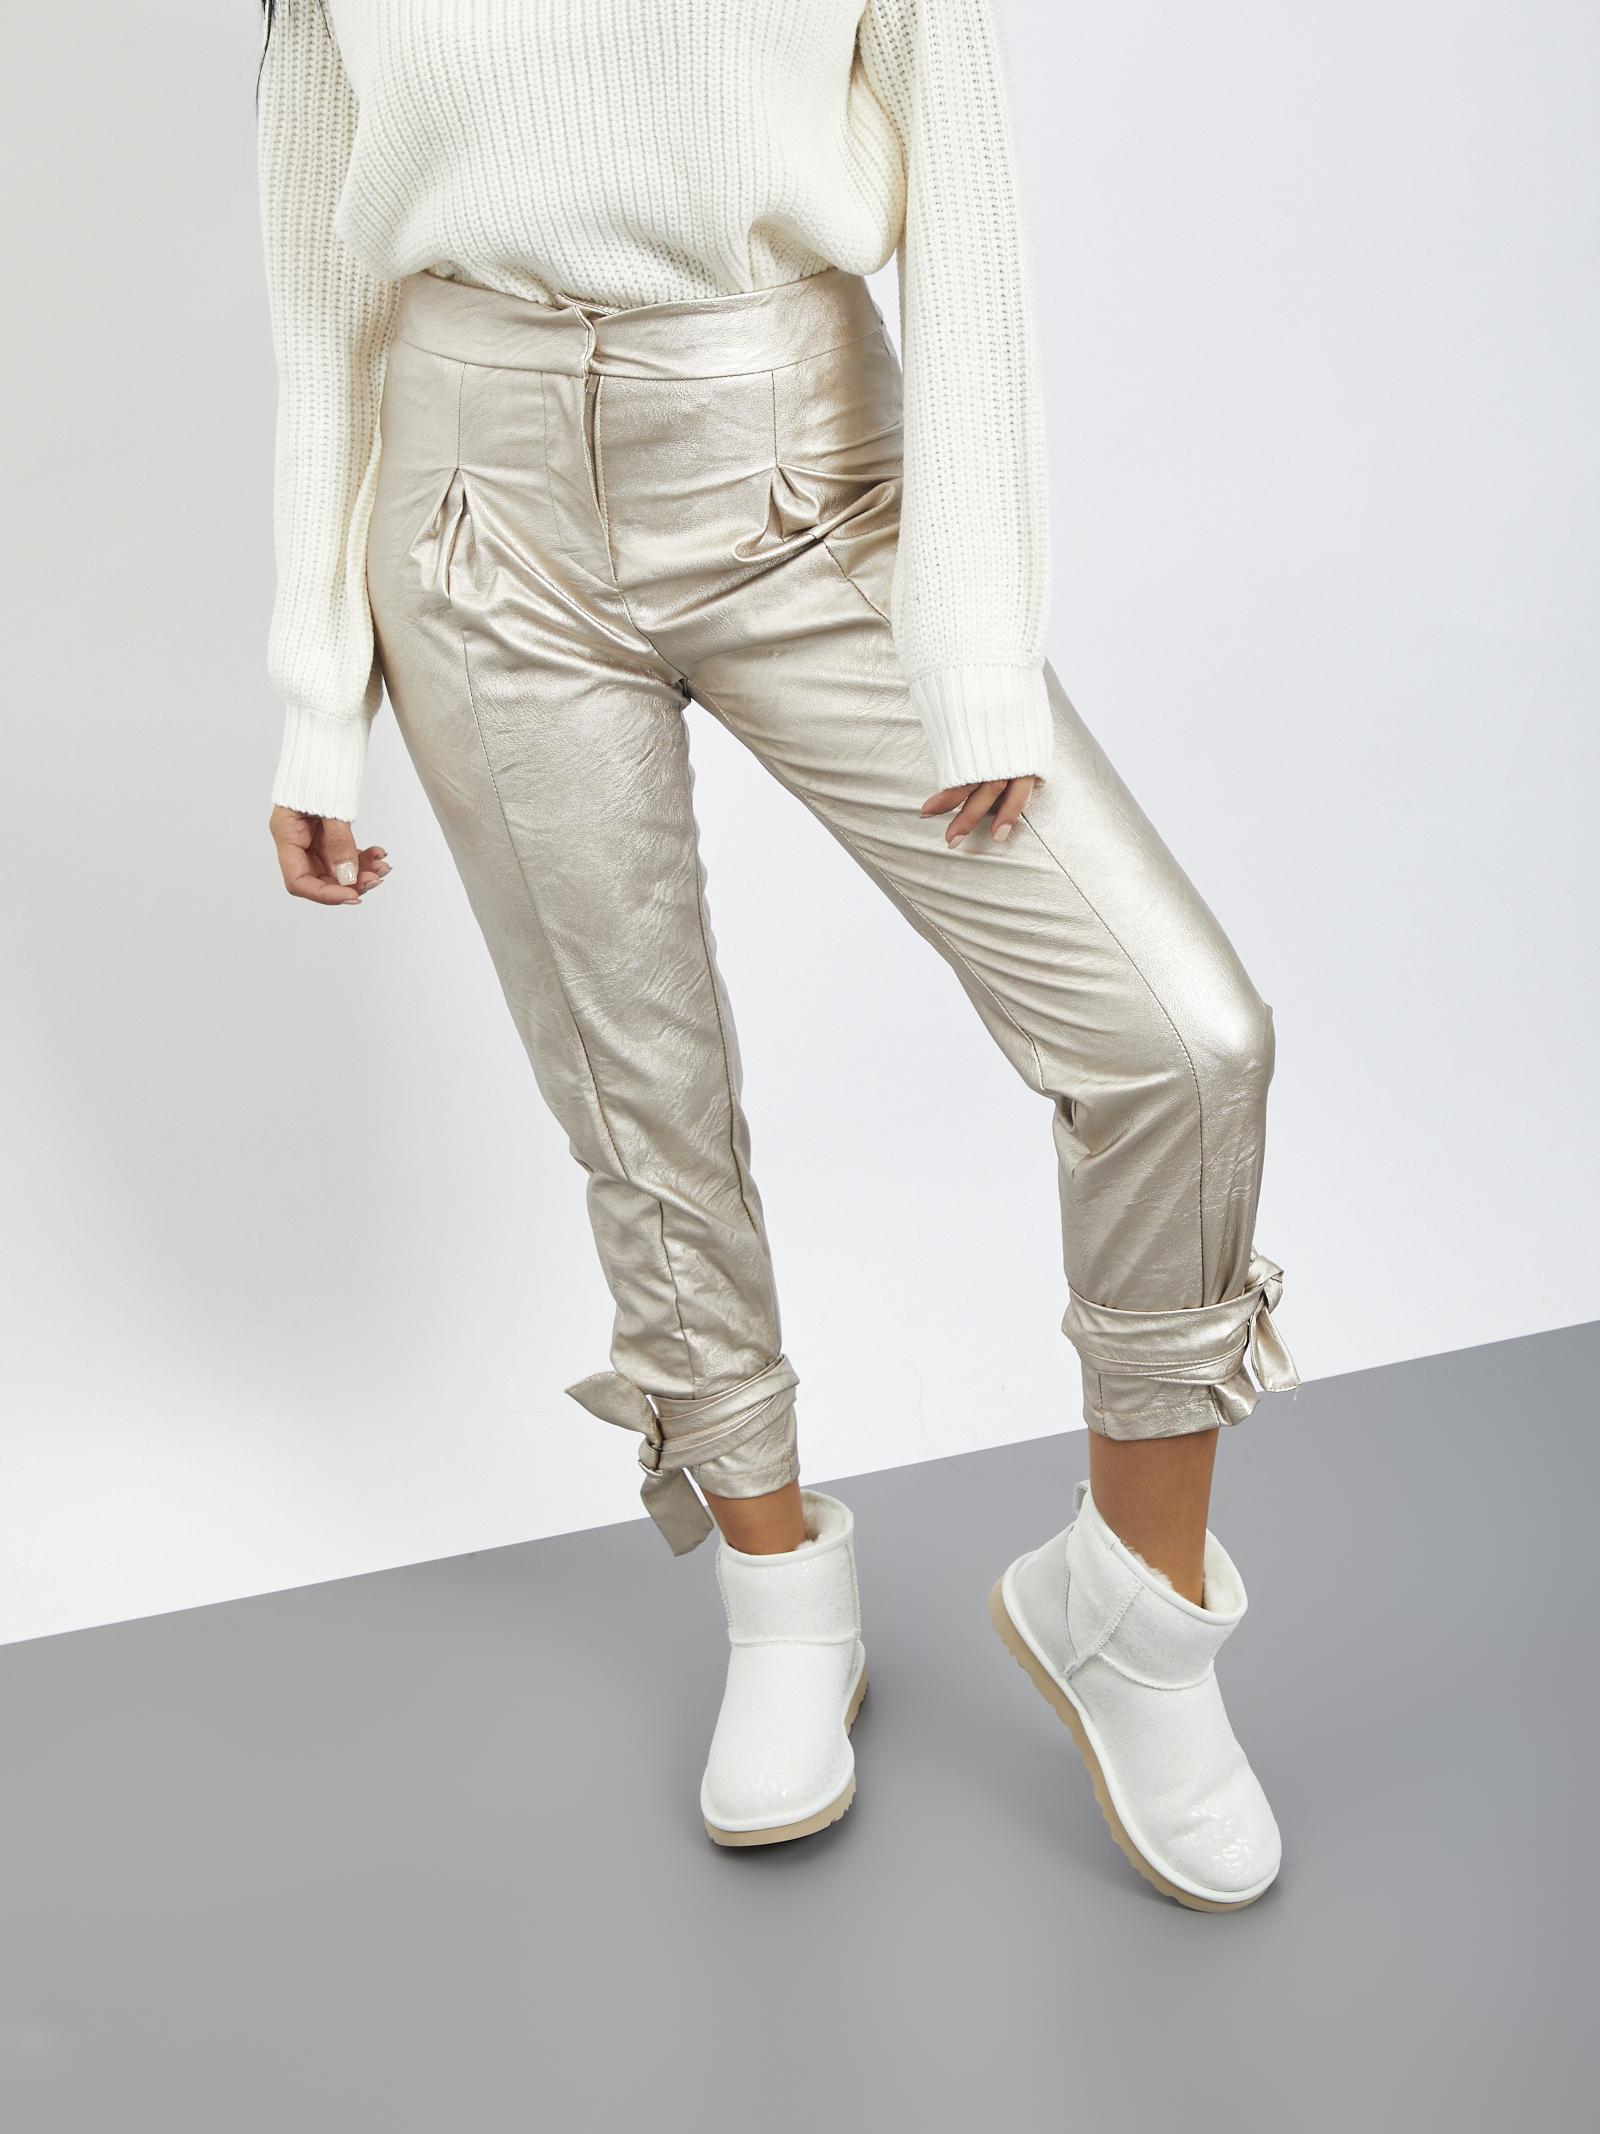 Pants laminato URINK | Pantaloni | KRISTAL PANTSORO